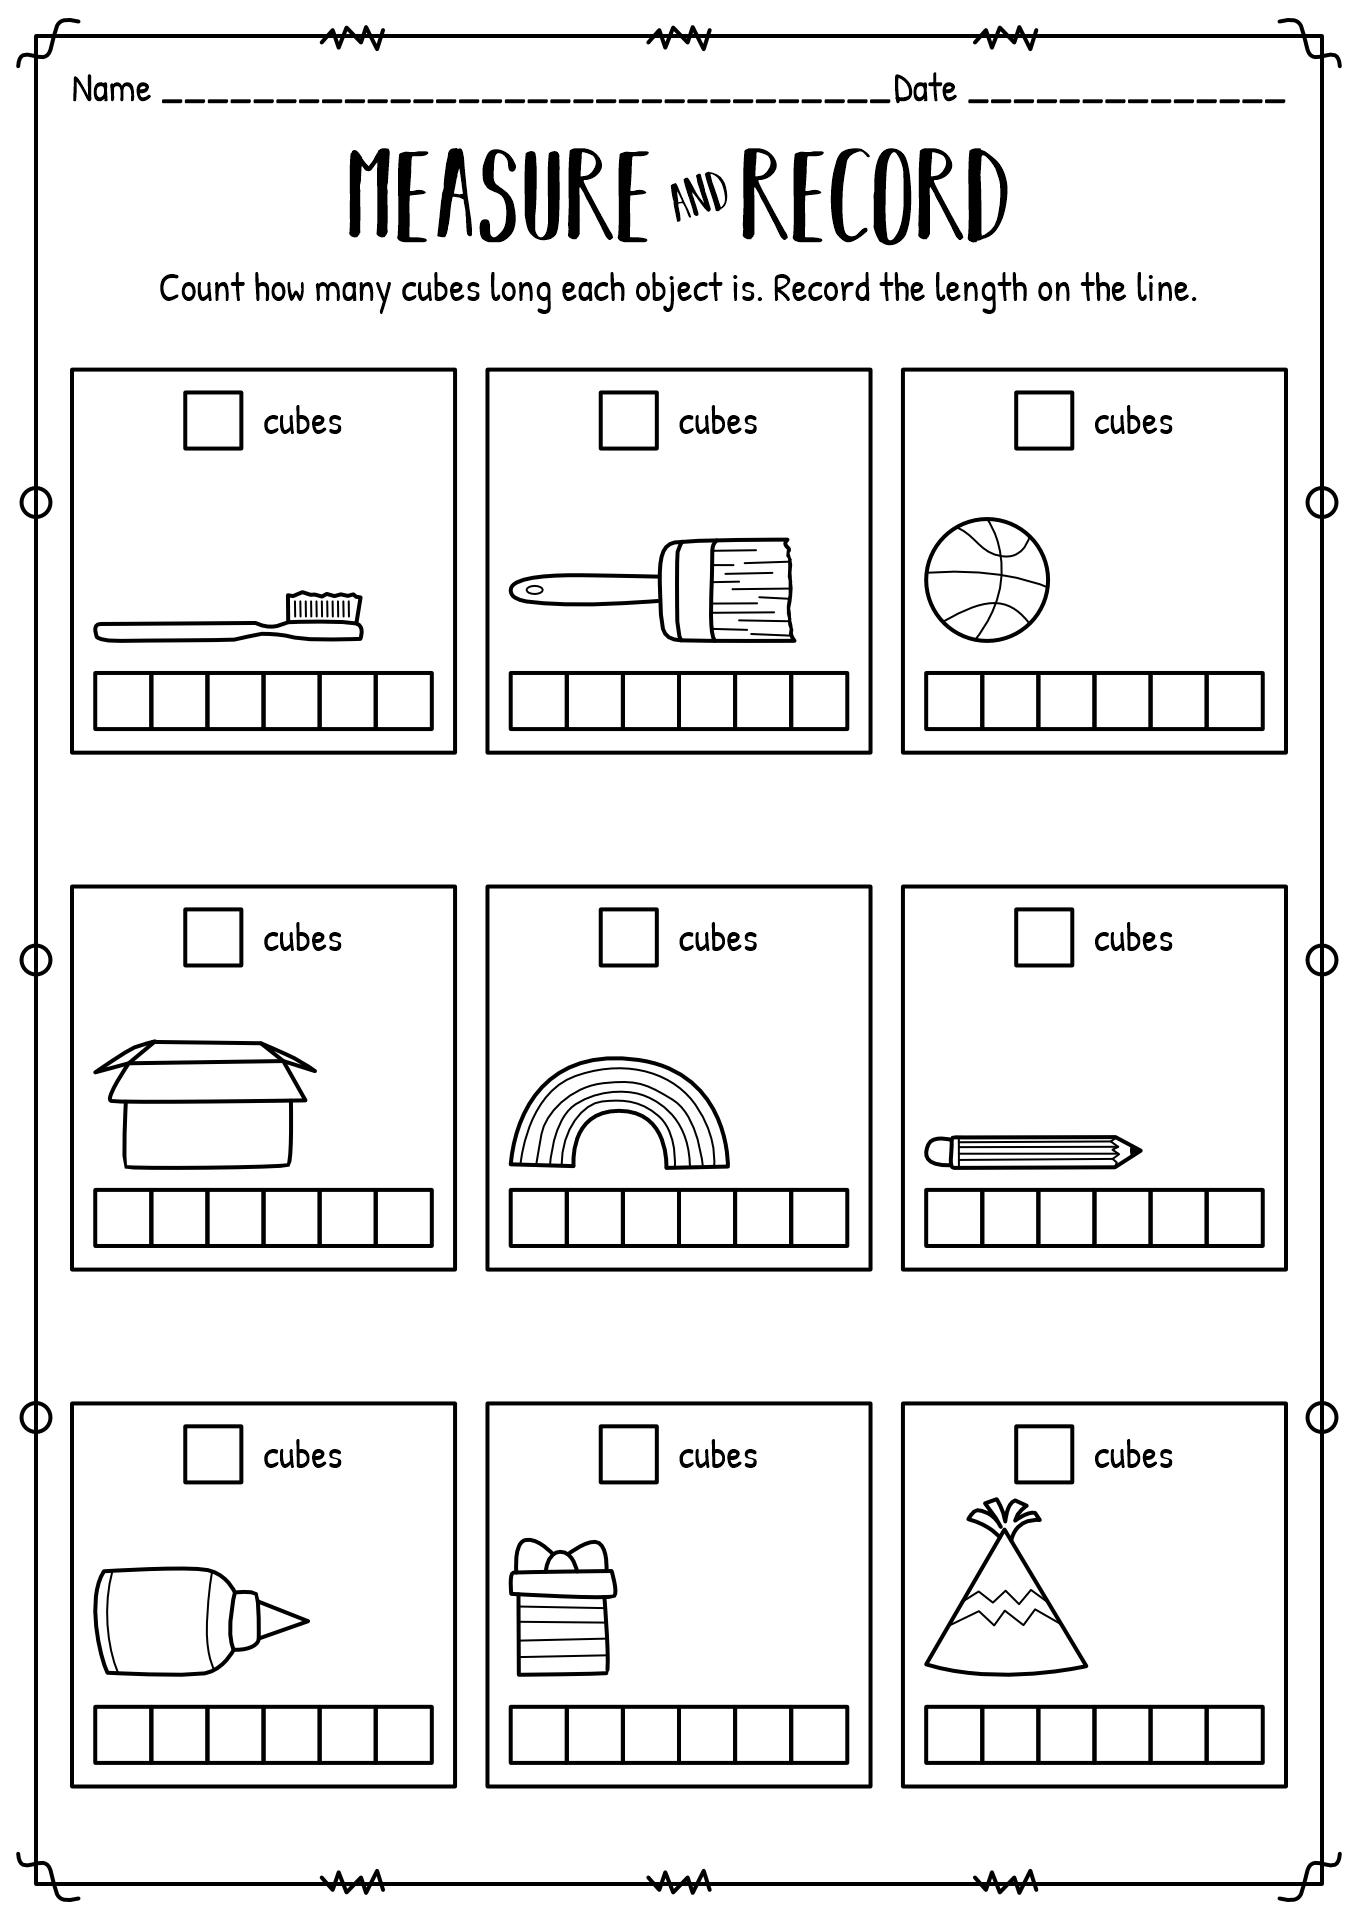 11 Best Images of Kindergarten Measurement Worksheets Free